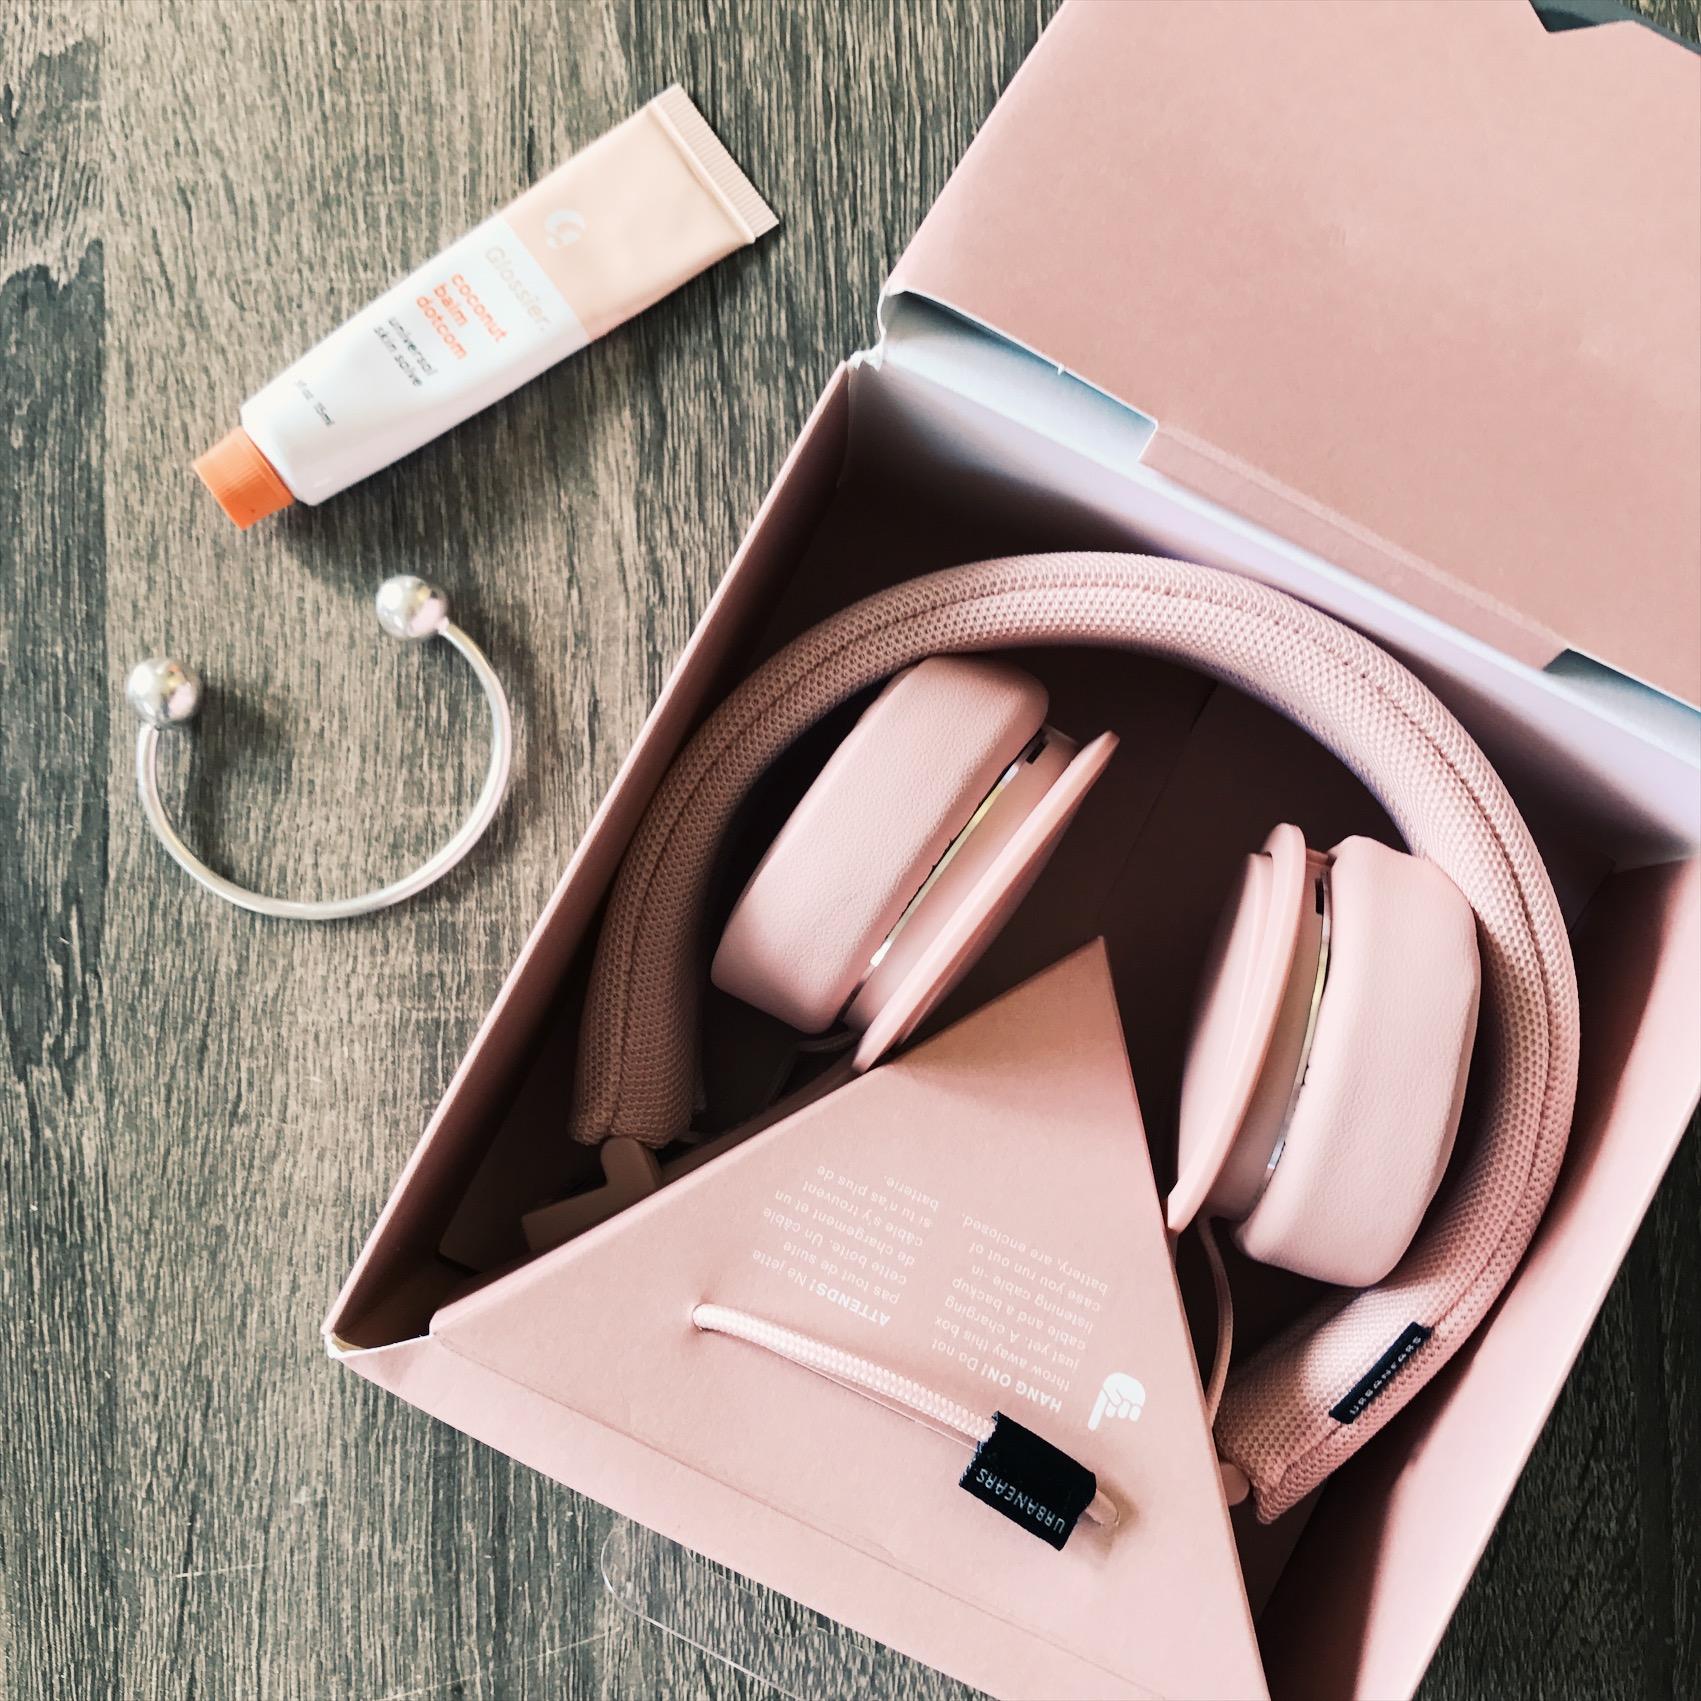 Glossier Coconut Balm Dotcom ,  Madewell cuff ,  Urbanears headphones